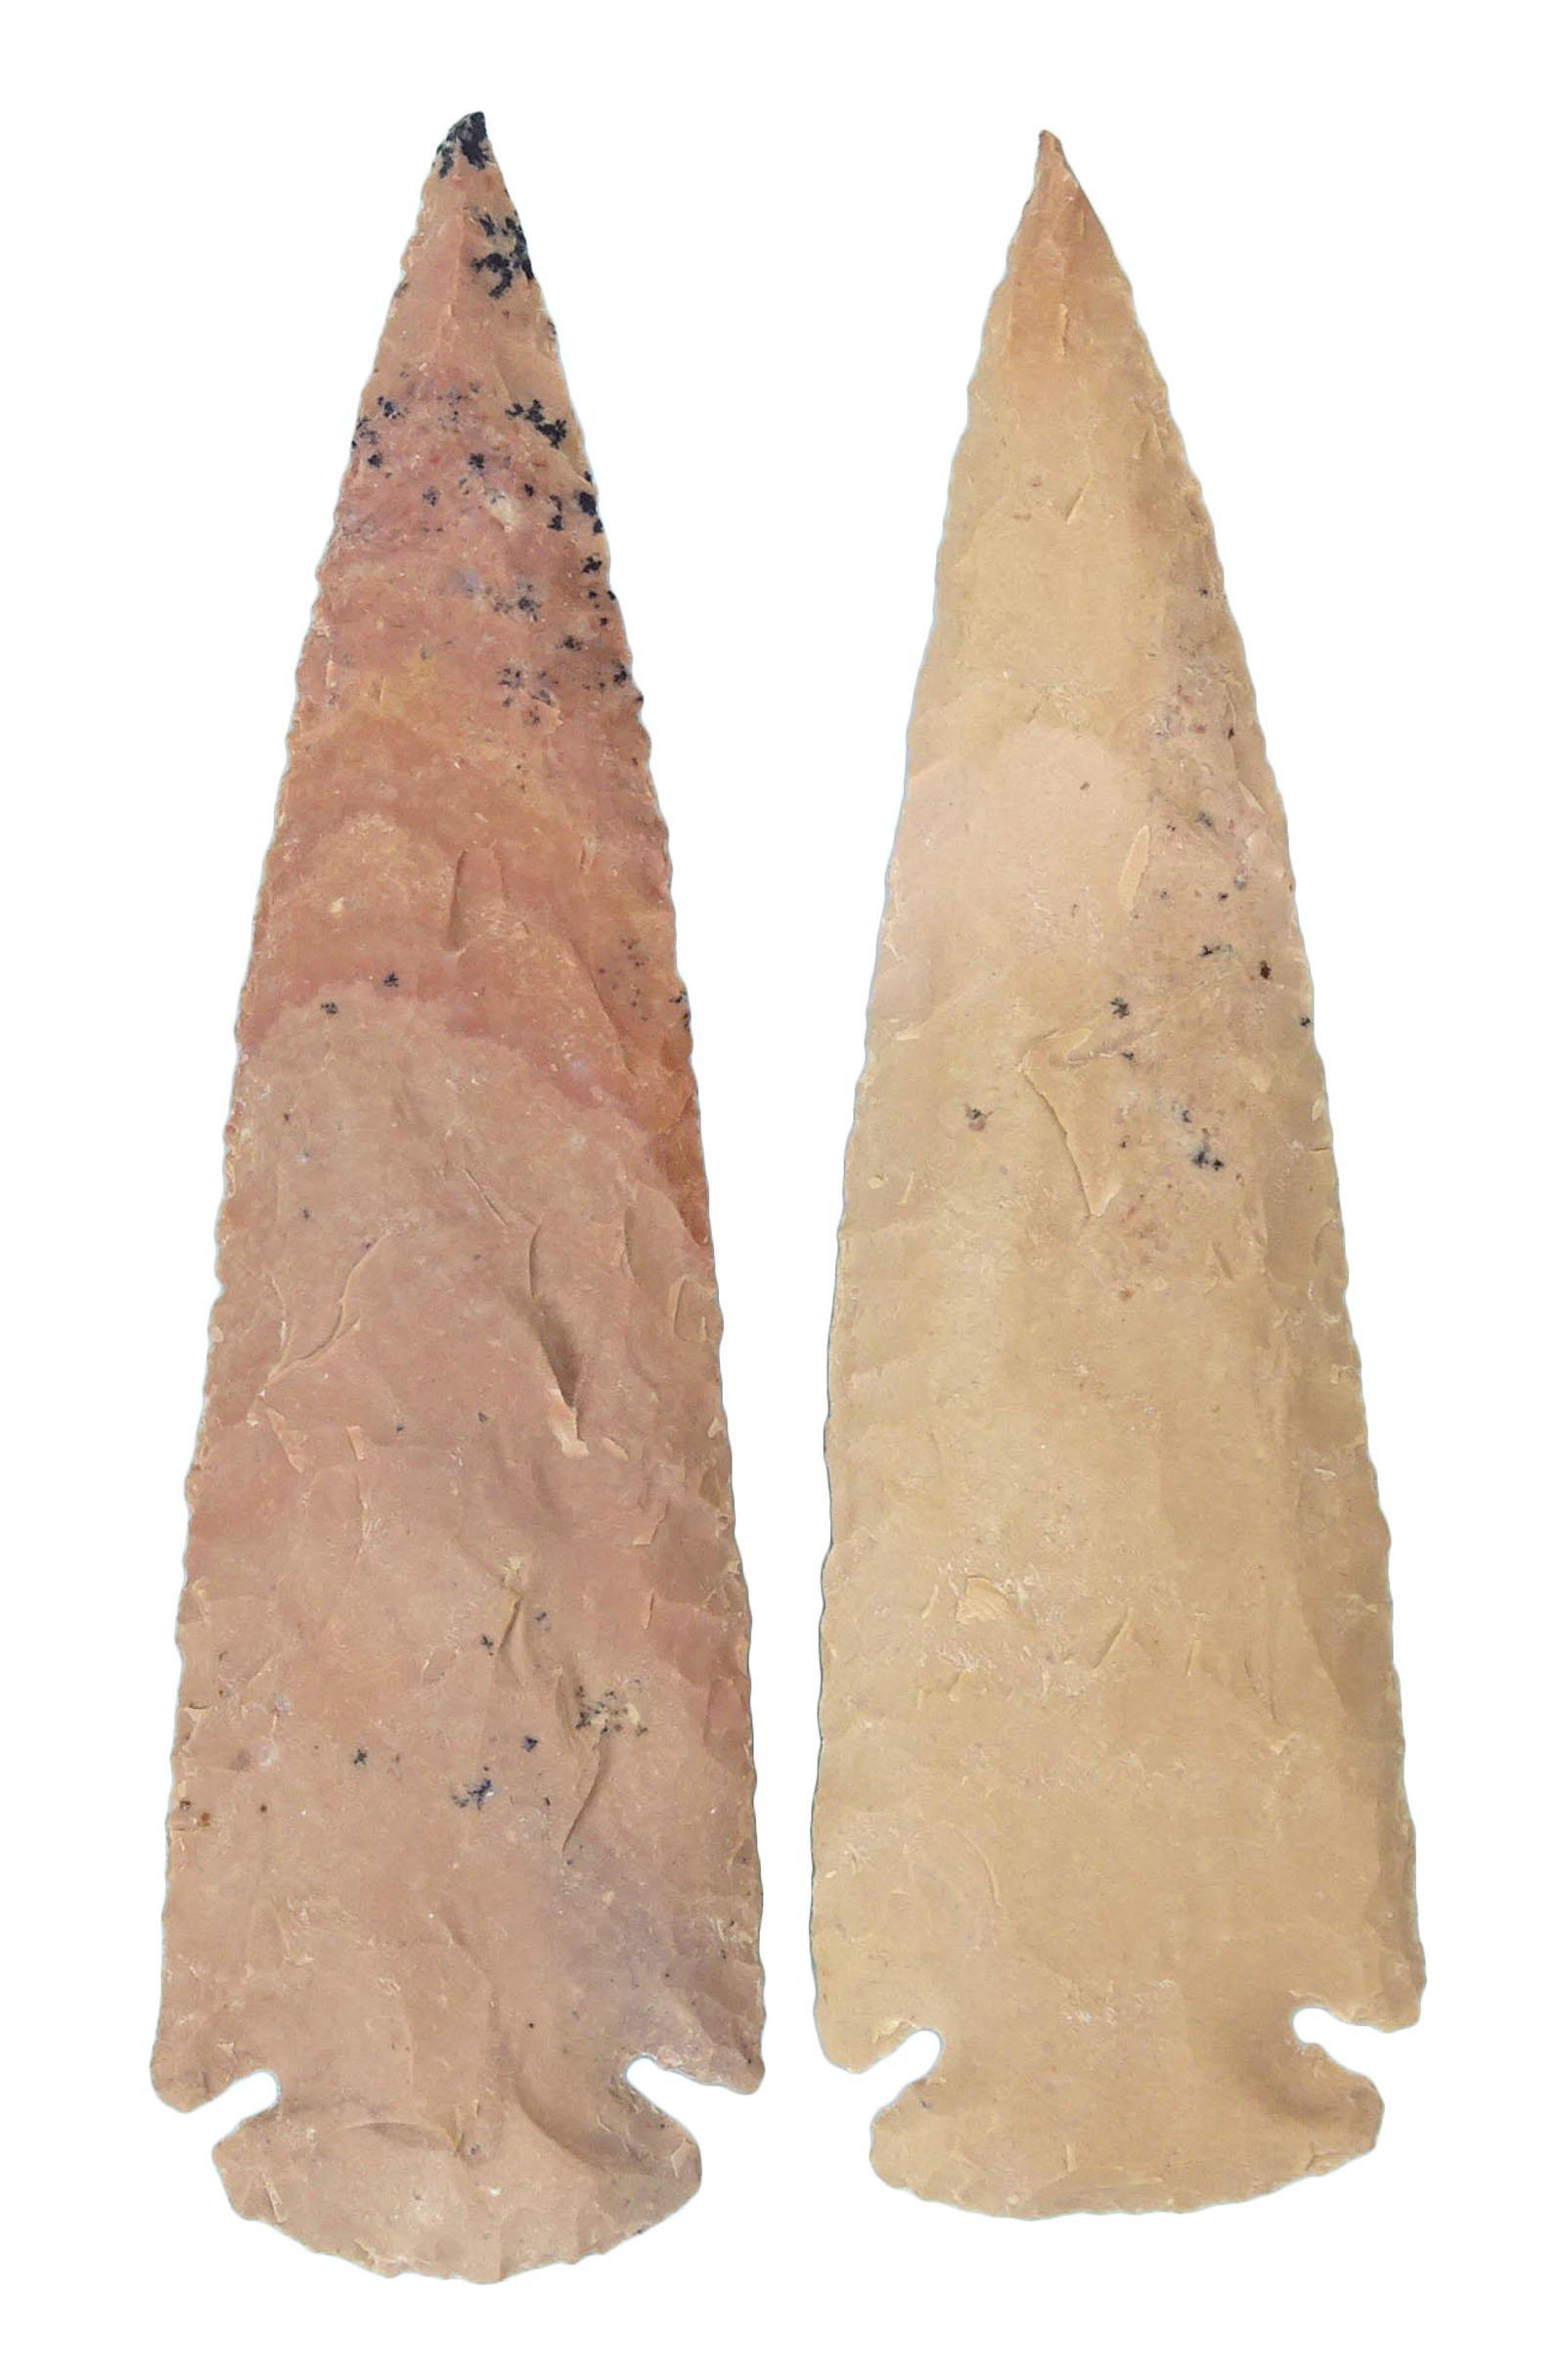 HARMONIZE Reiki Healing Crystal Agate Stone Natural Handmade Set of 2 Spearhead Arrowhead by HARMONIZE